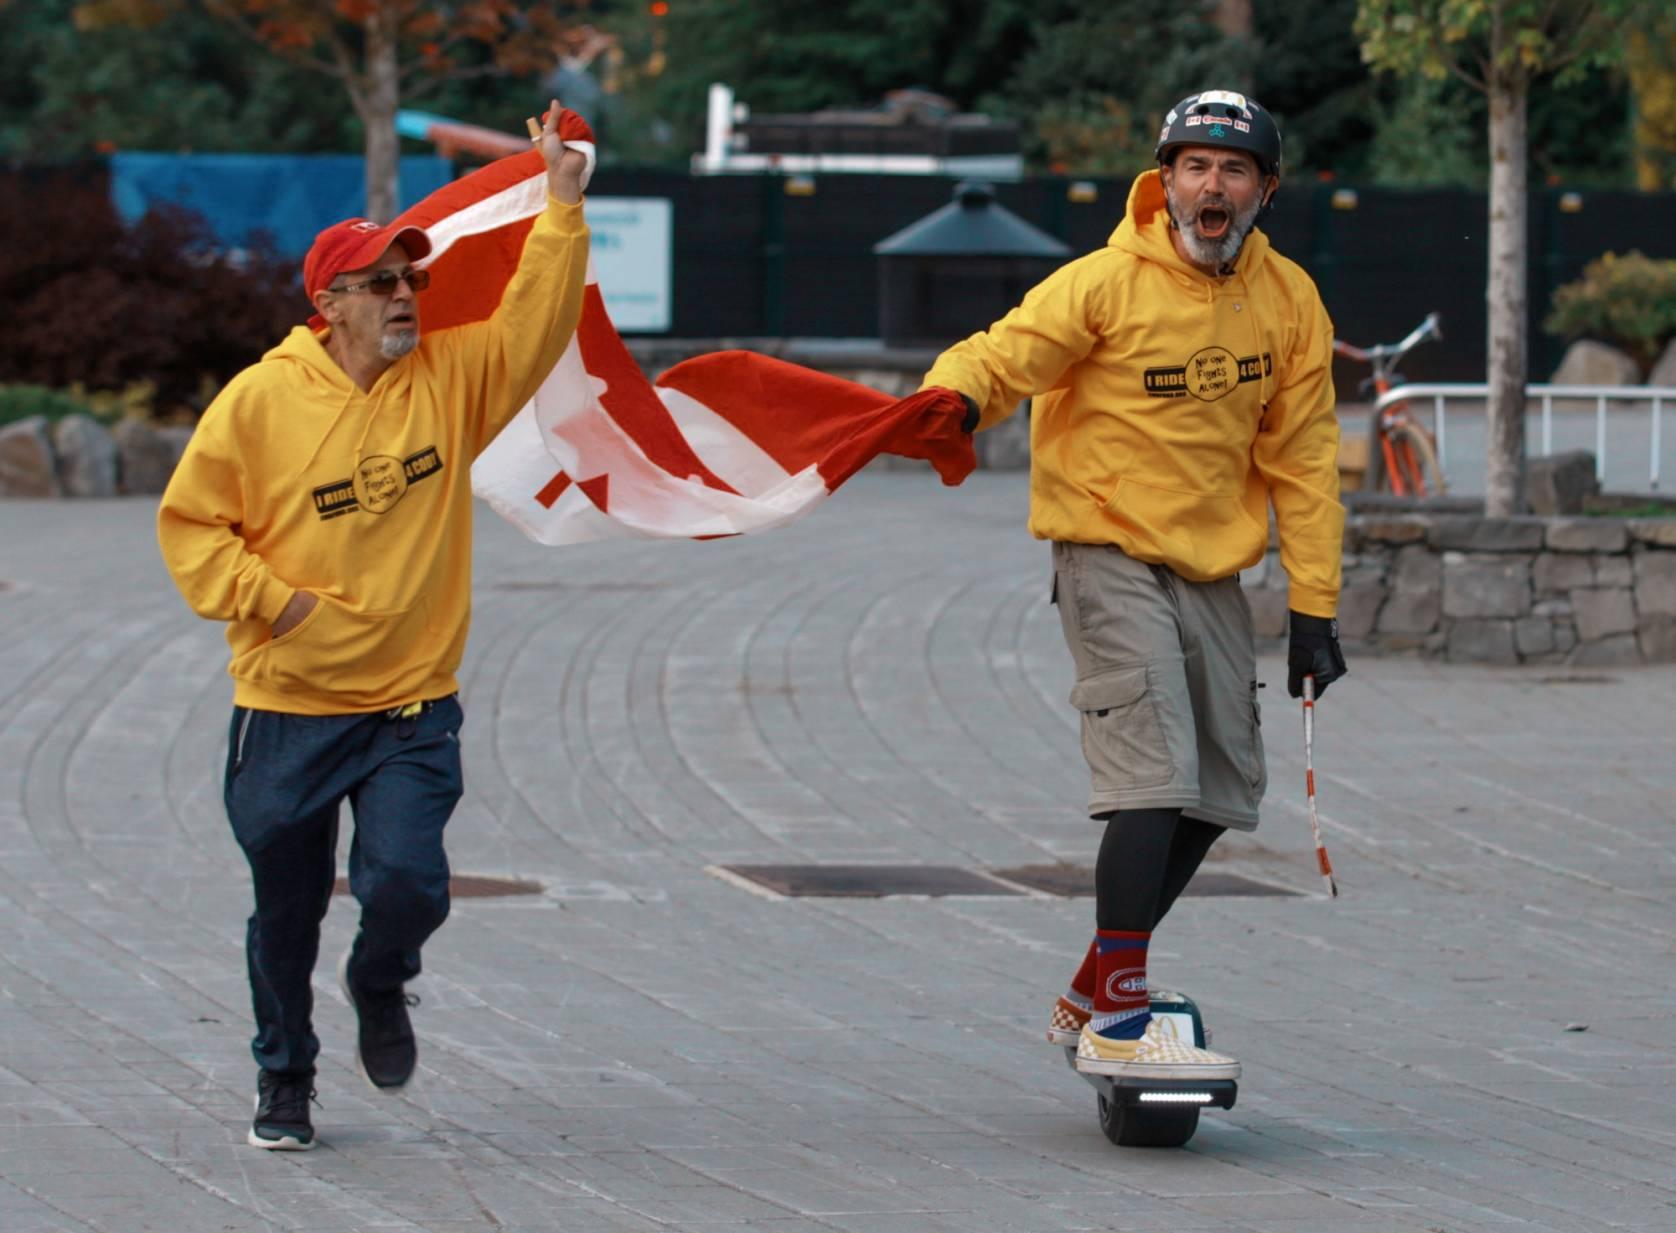 John Shrier onewheeling through Canada